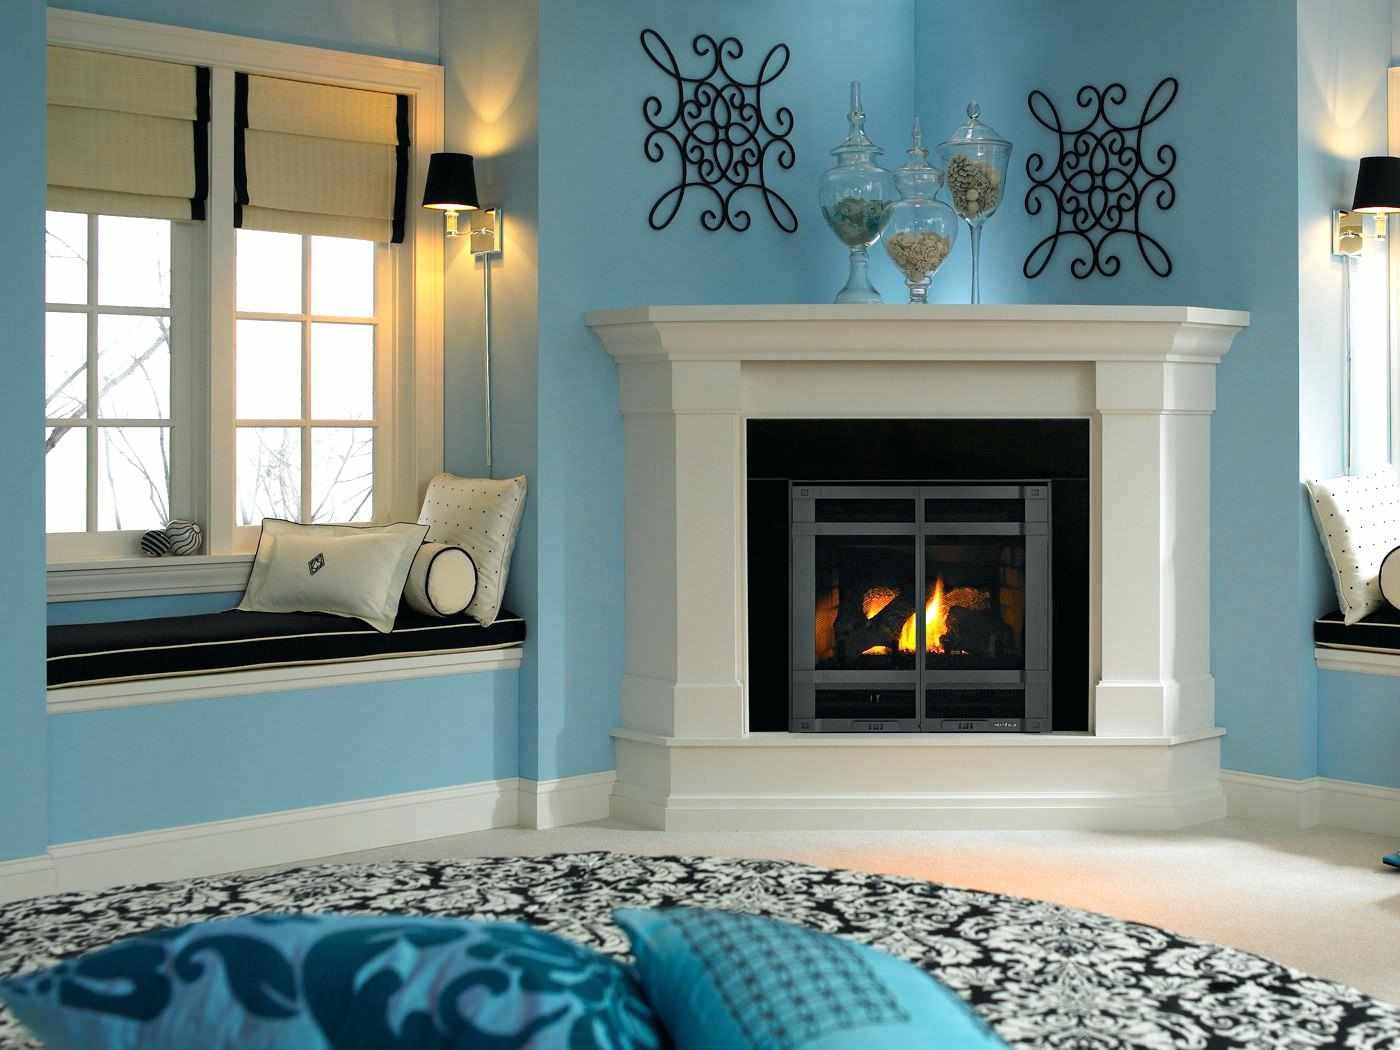 Голубой интерьер с белым угловым камином